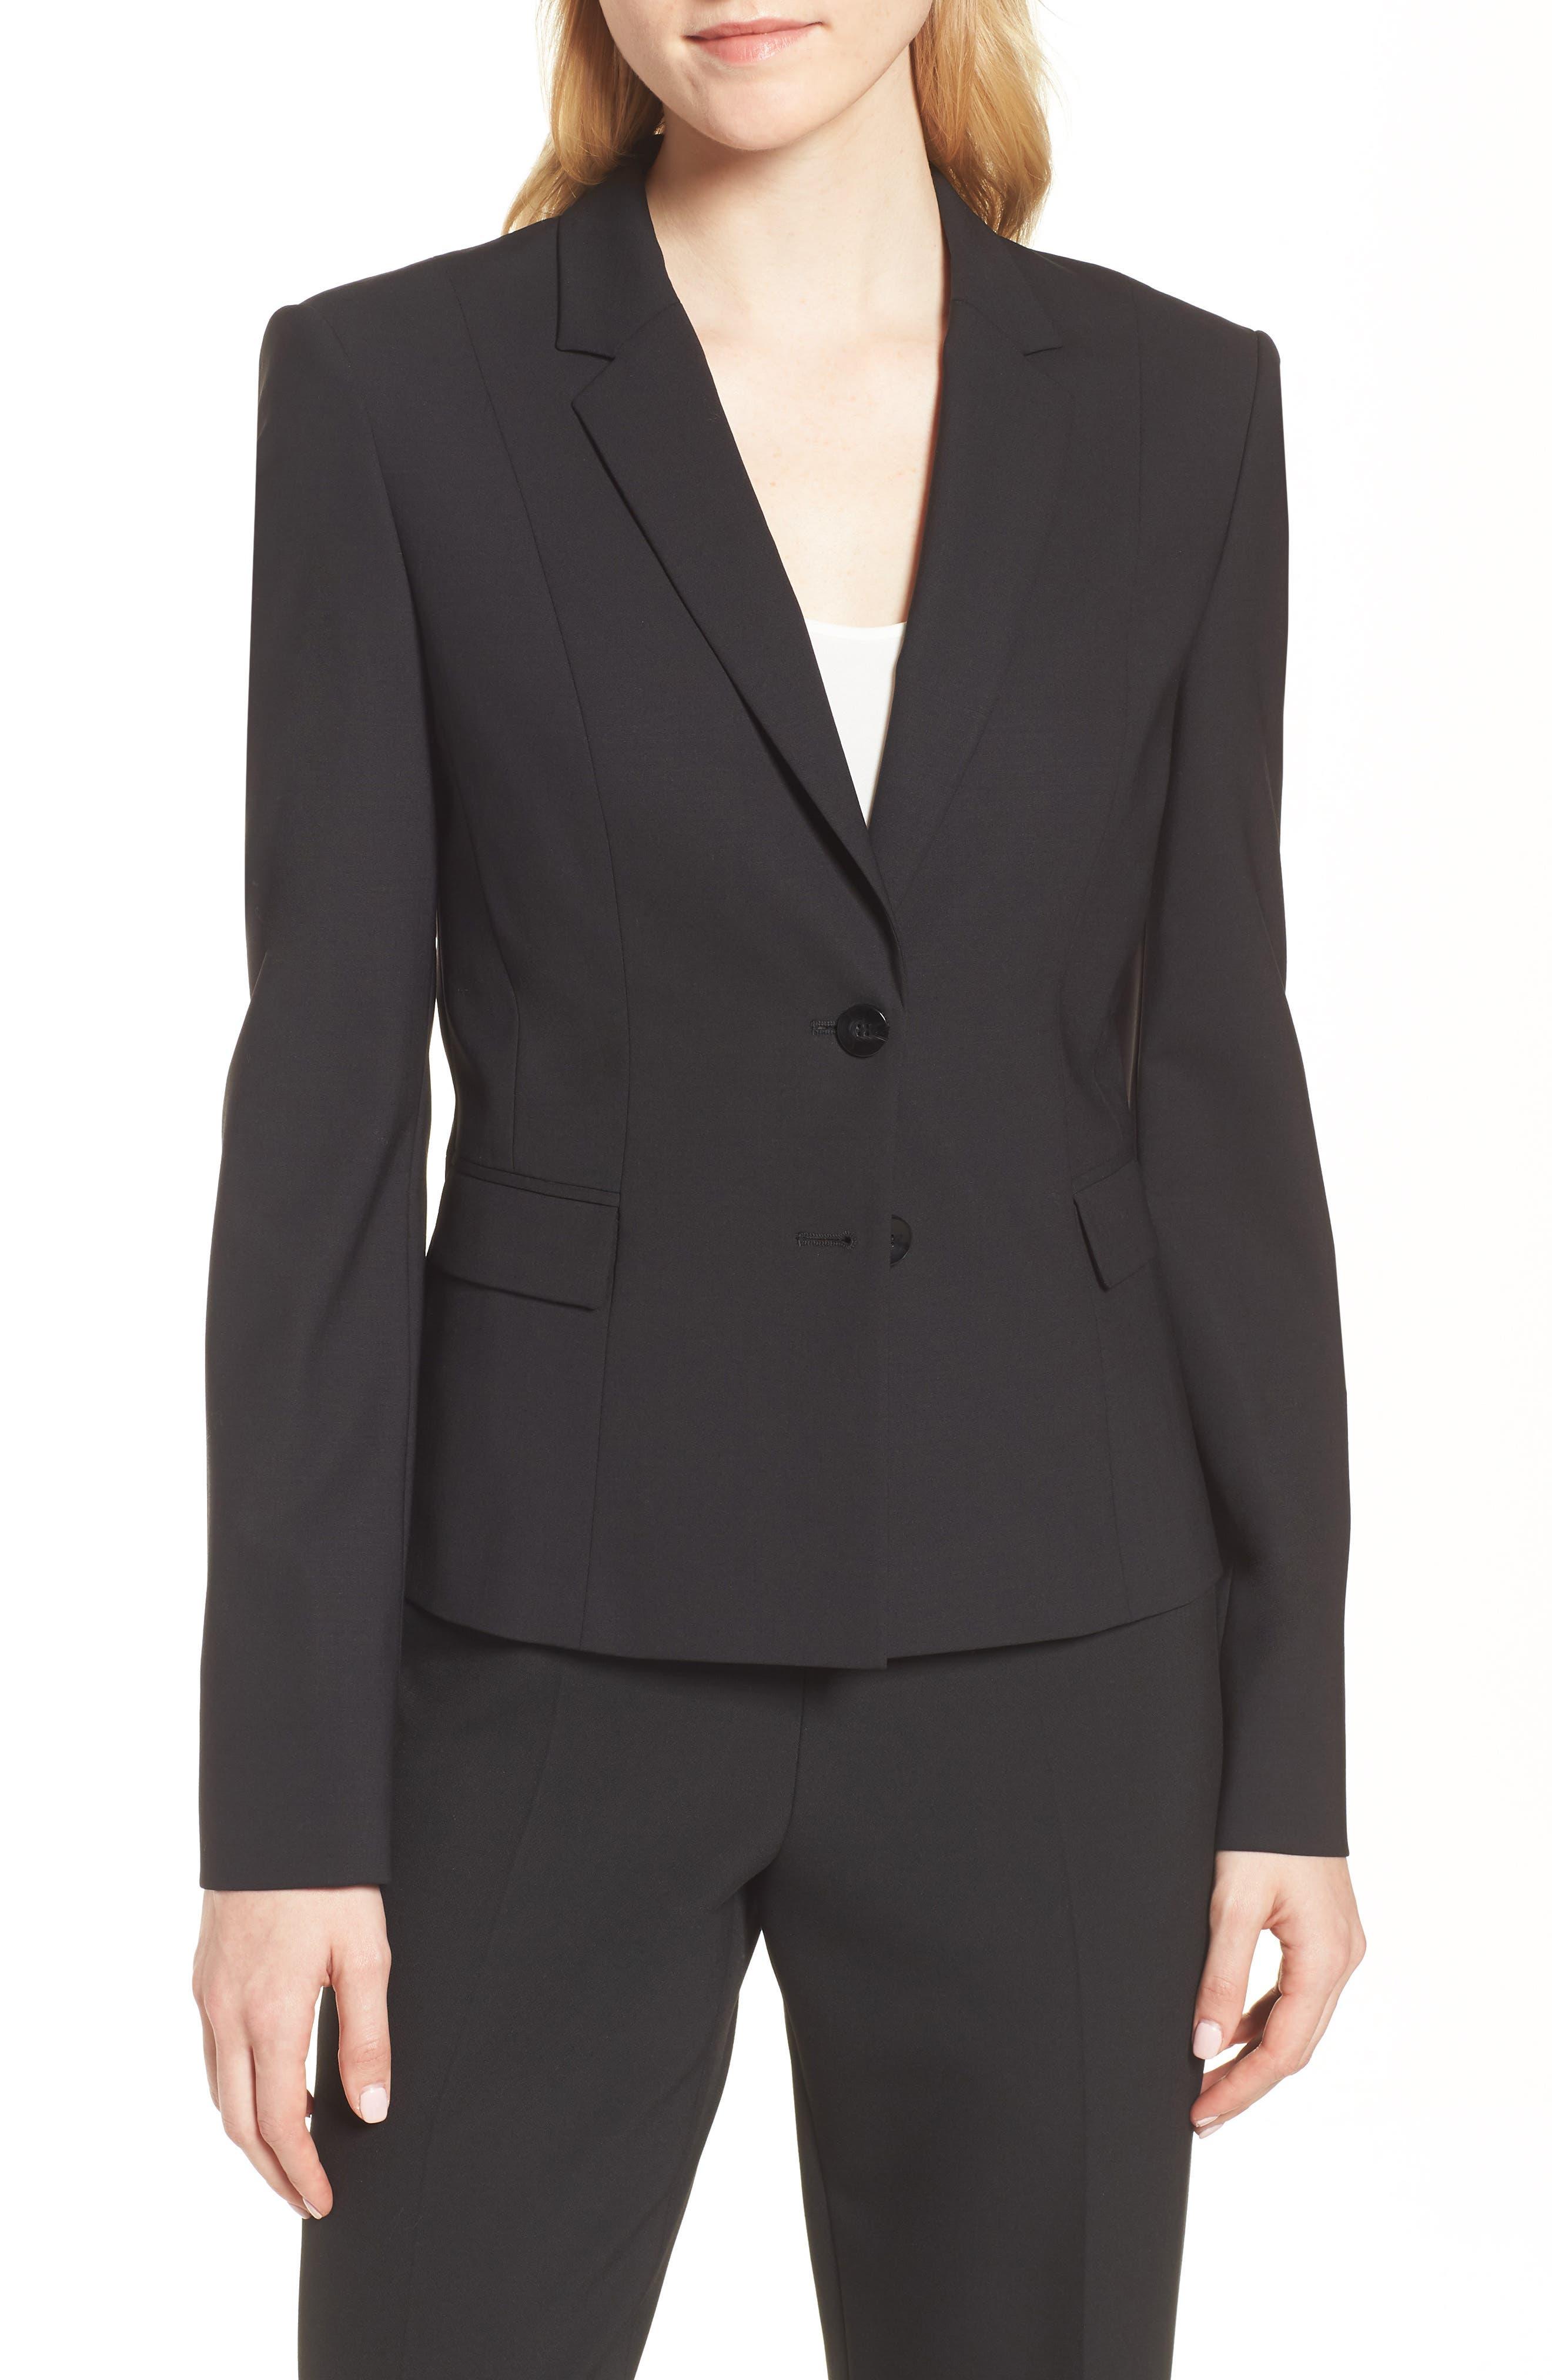 Jaru Stretch Wool Suit Jacket,                             Main thumbnail 1, color,                             Black